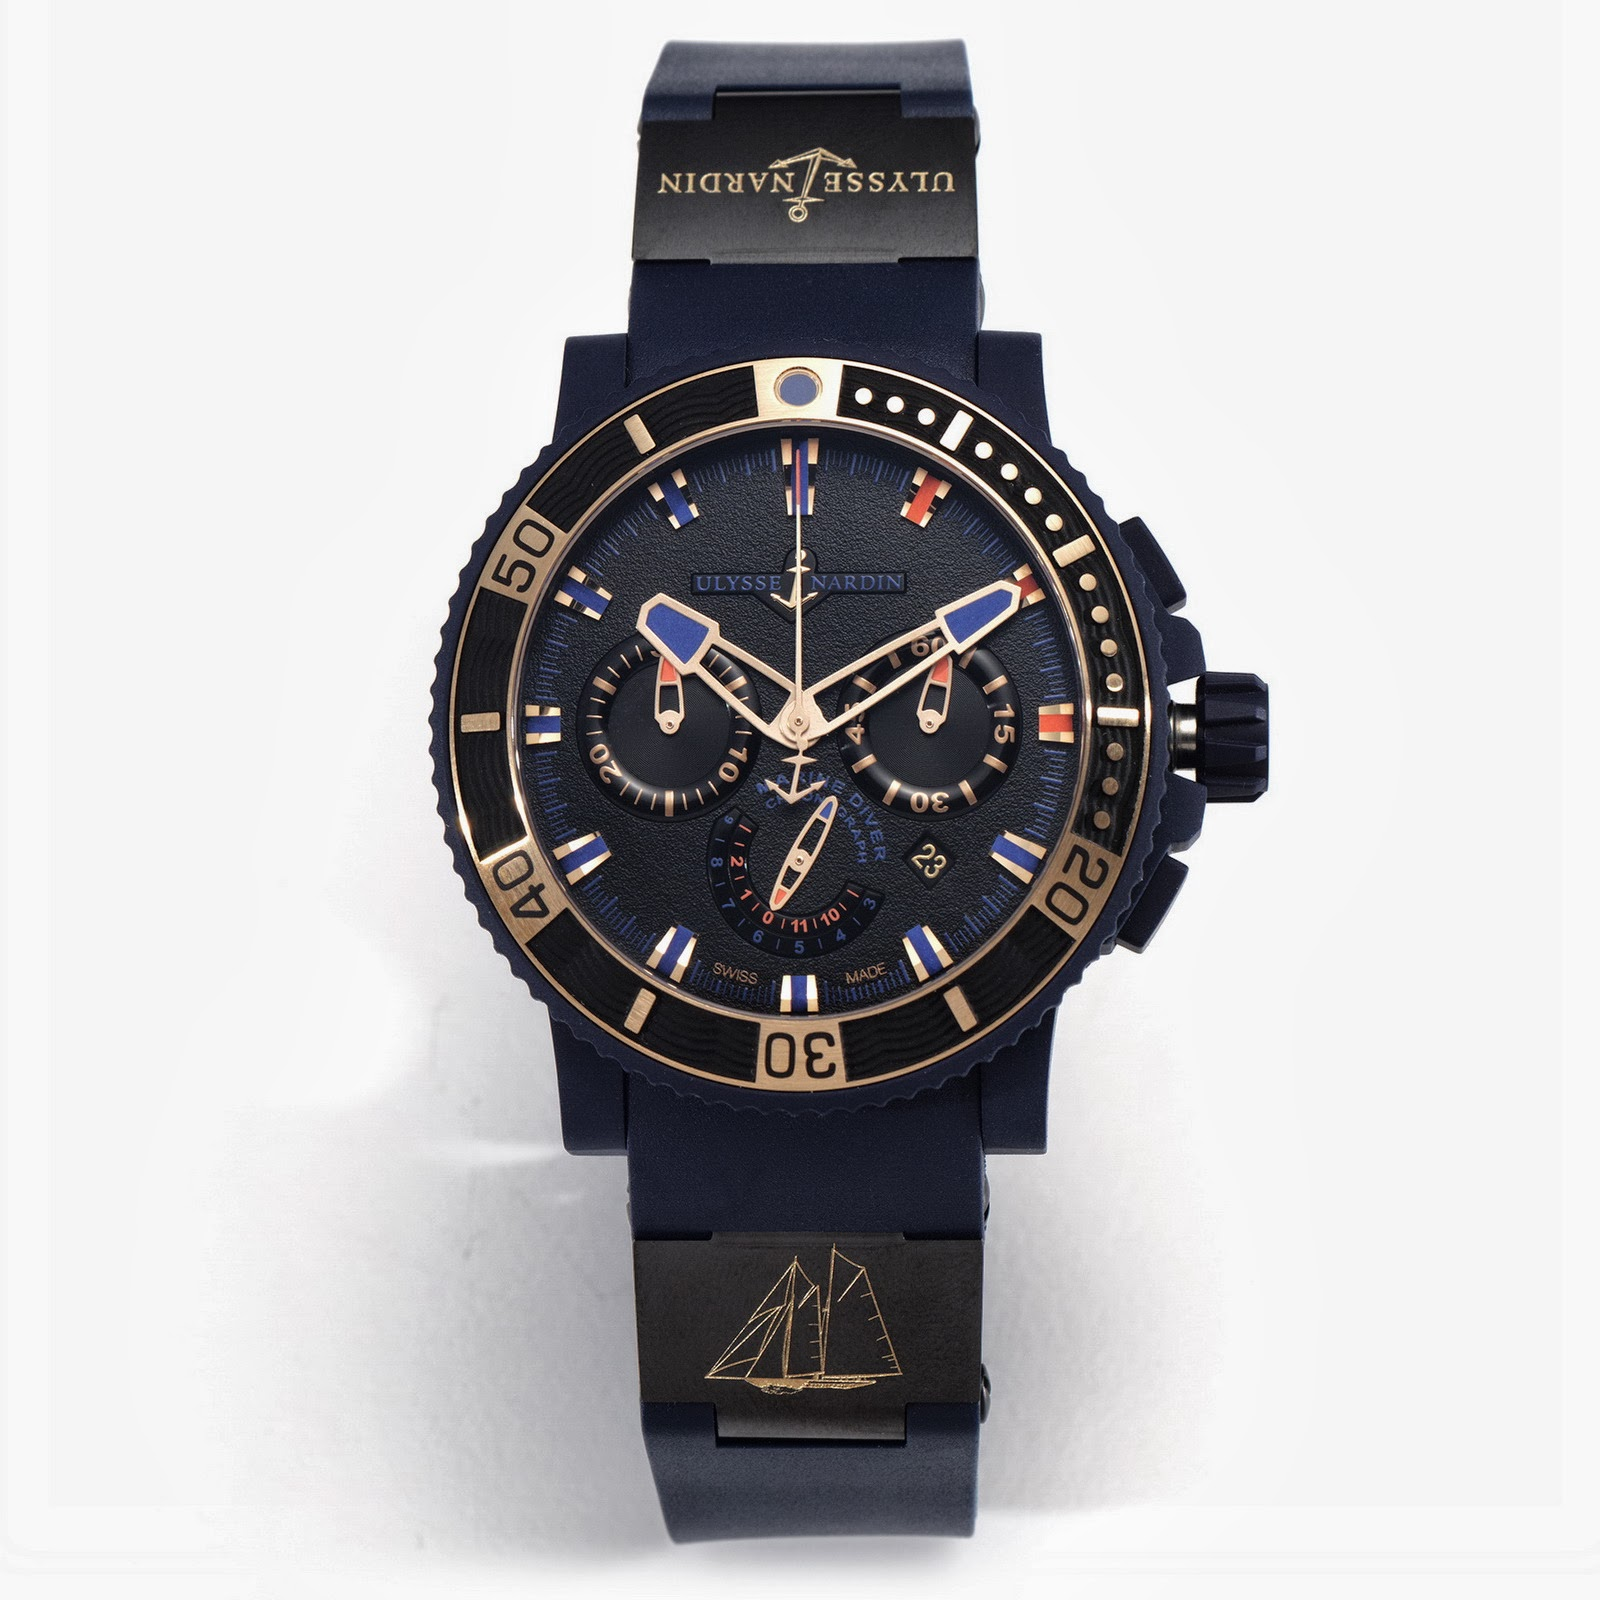 Neue Uhr : Ulysse-Nardin Schooner Chronograph - UhrForum